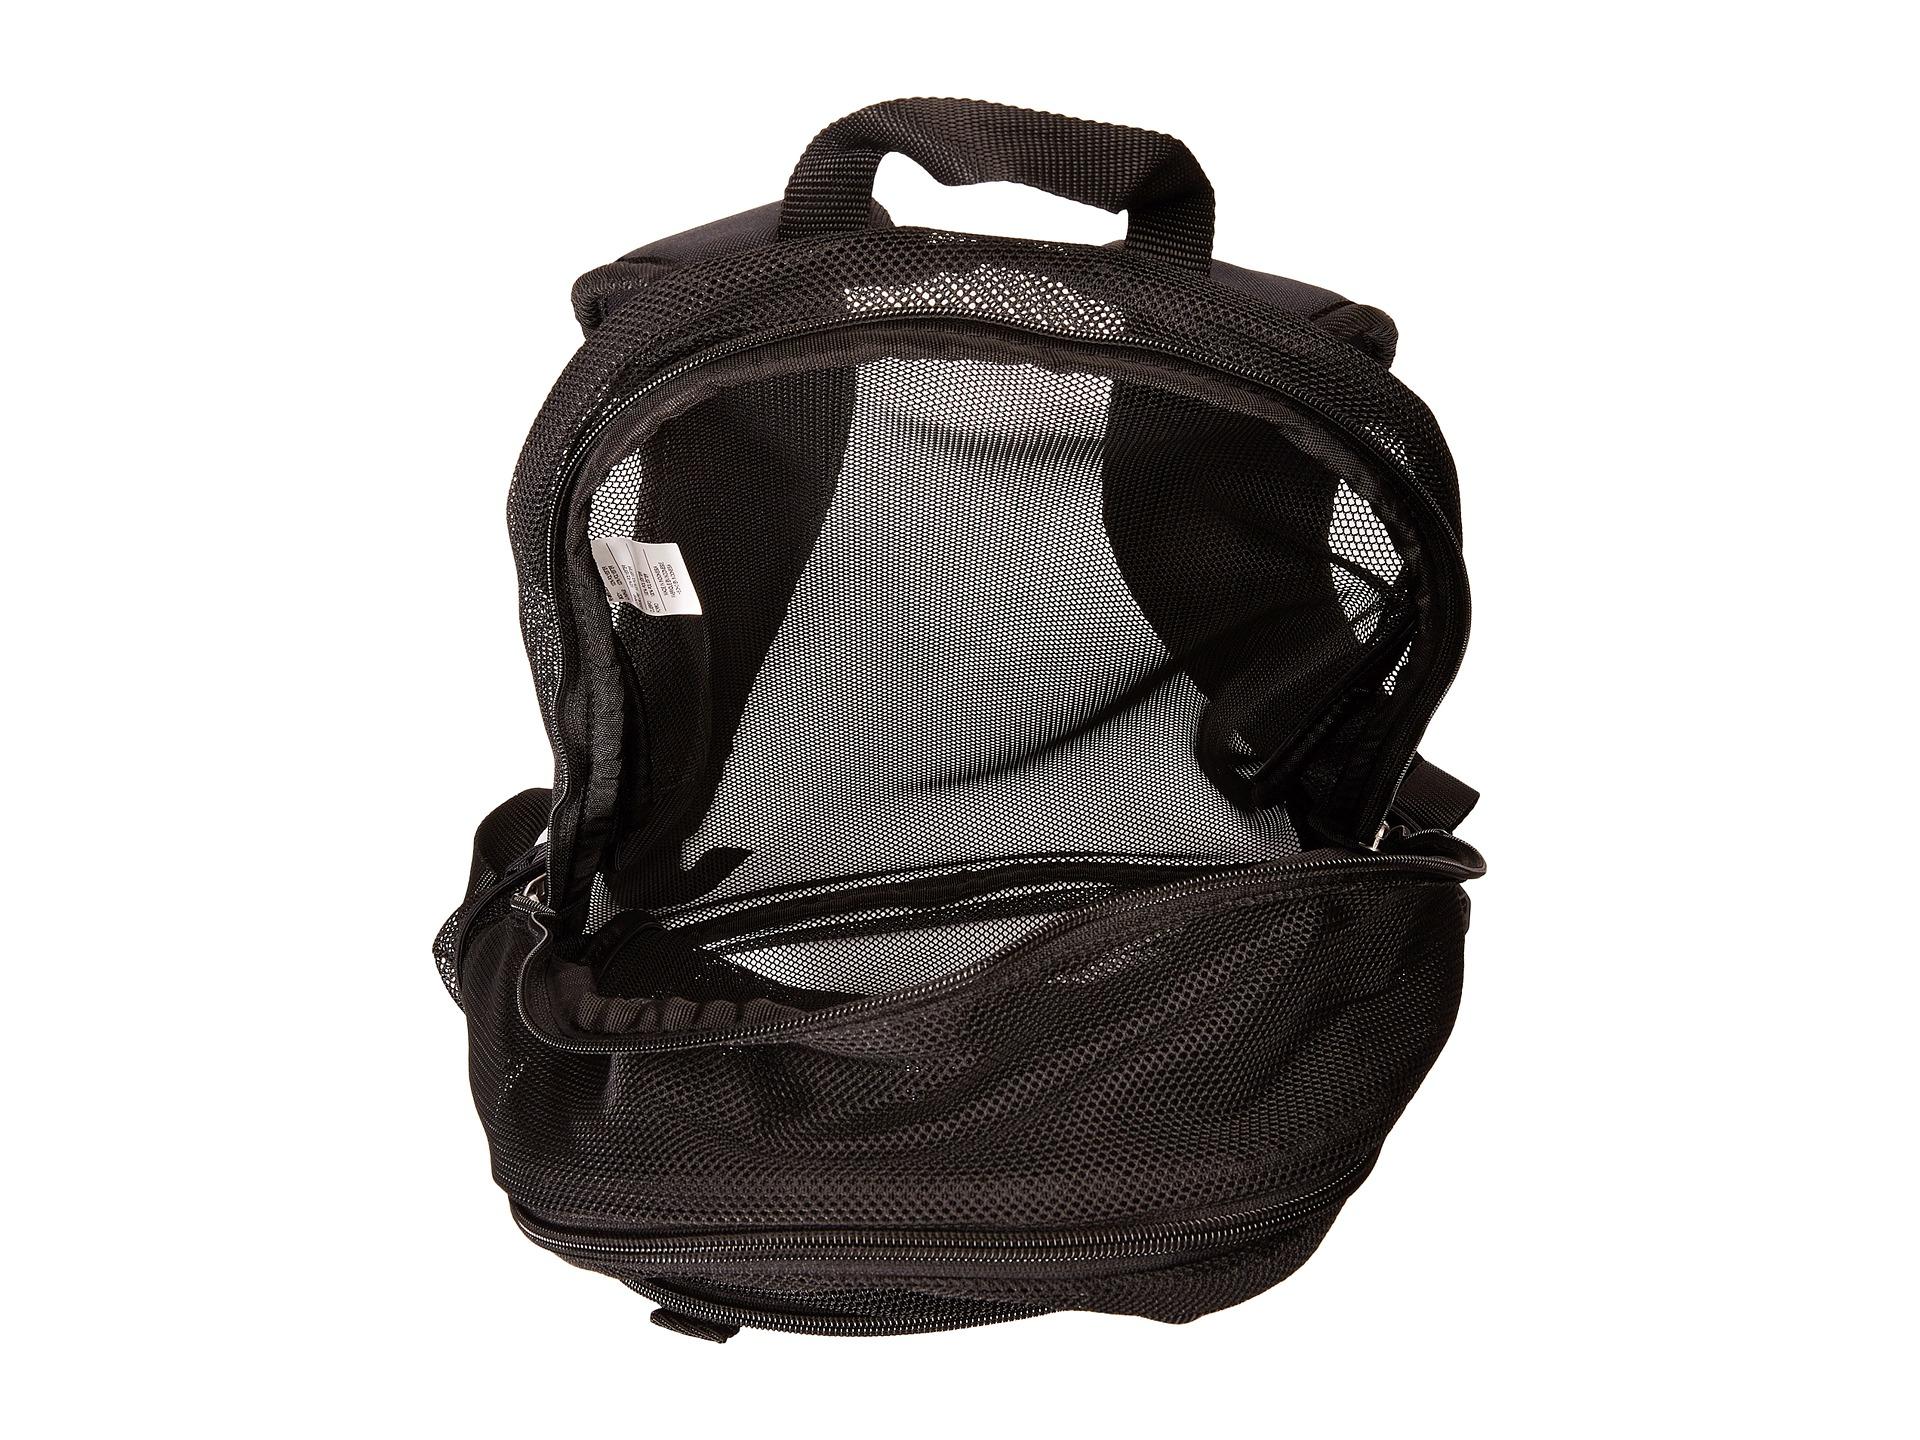 002a11a8a2 Lyst - Nike Brasilia 7 Backpack Mesh Large in Black